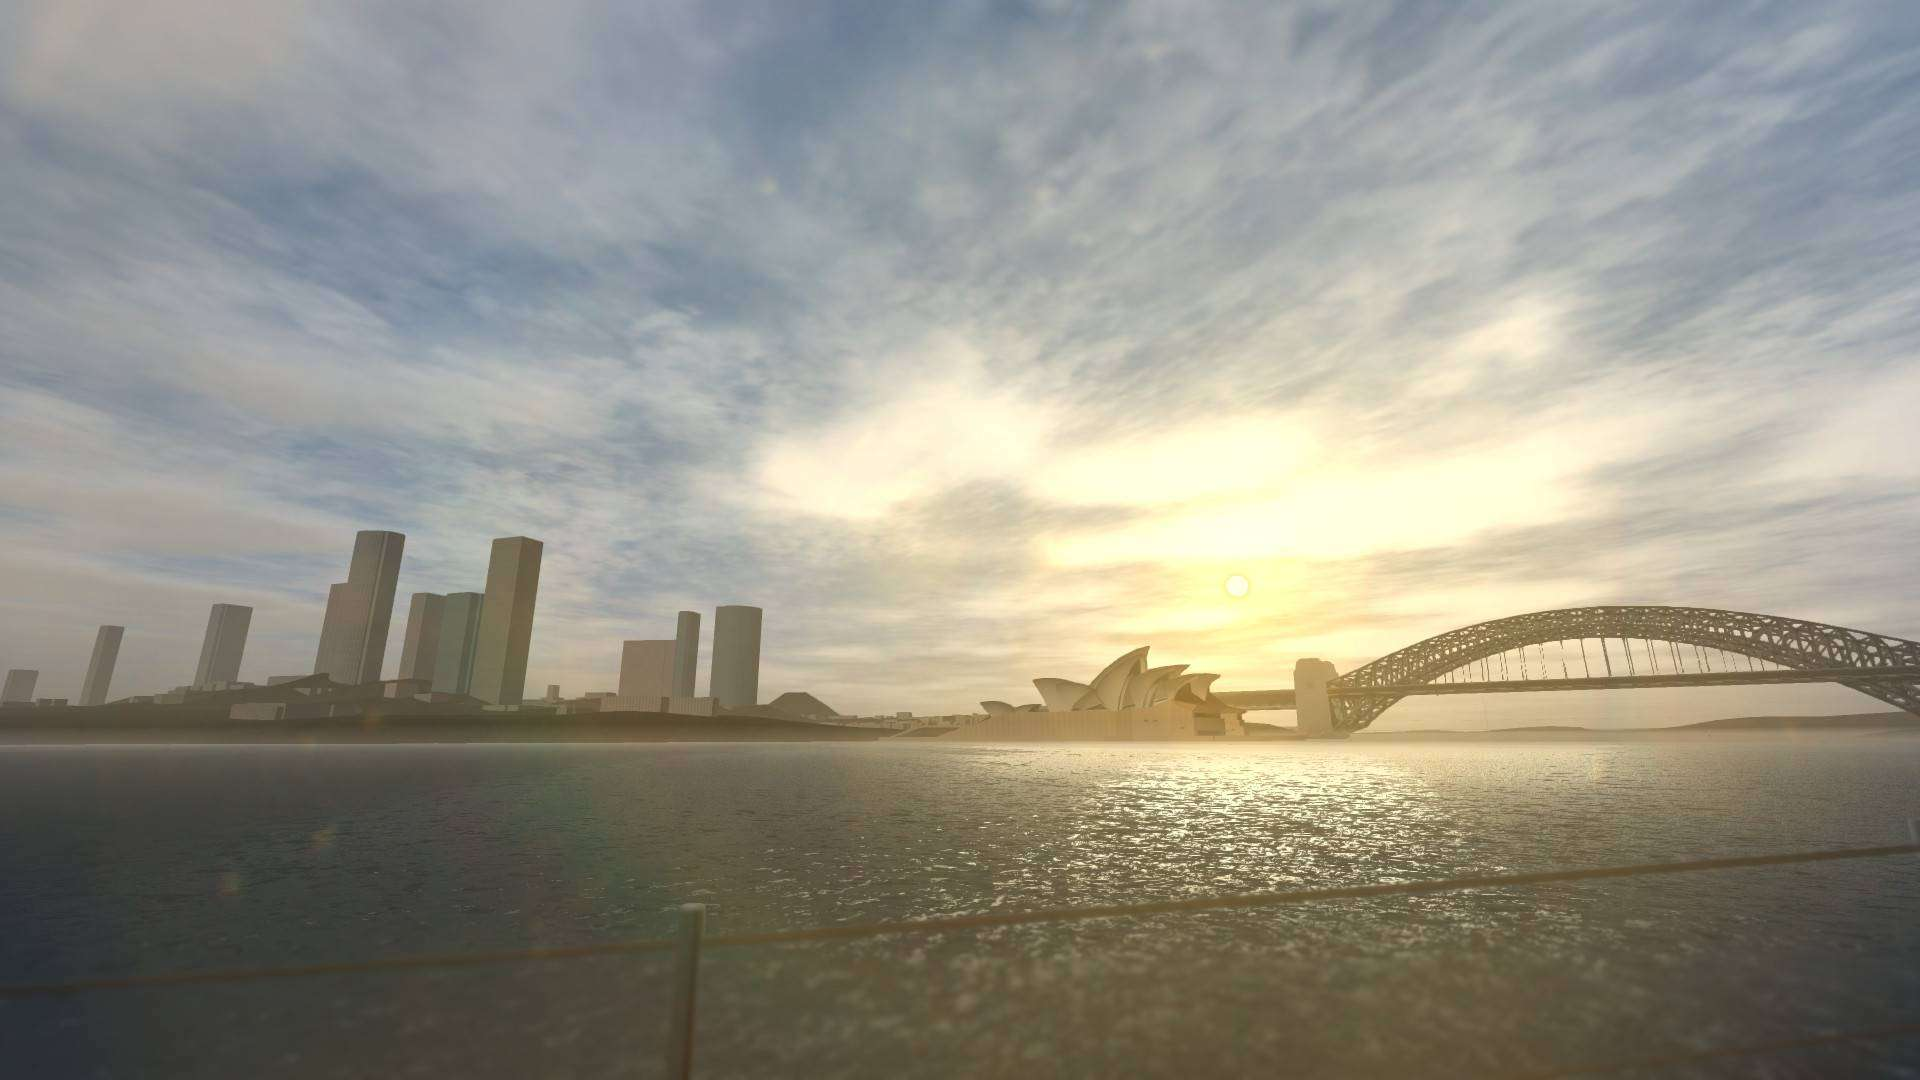 Velocità datazione Sydney mercoledì Odense incontri